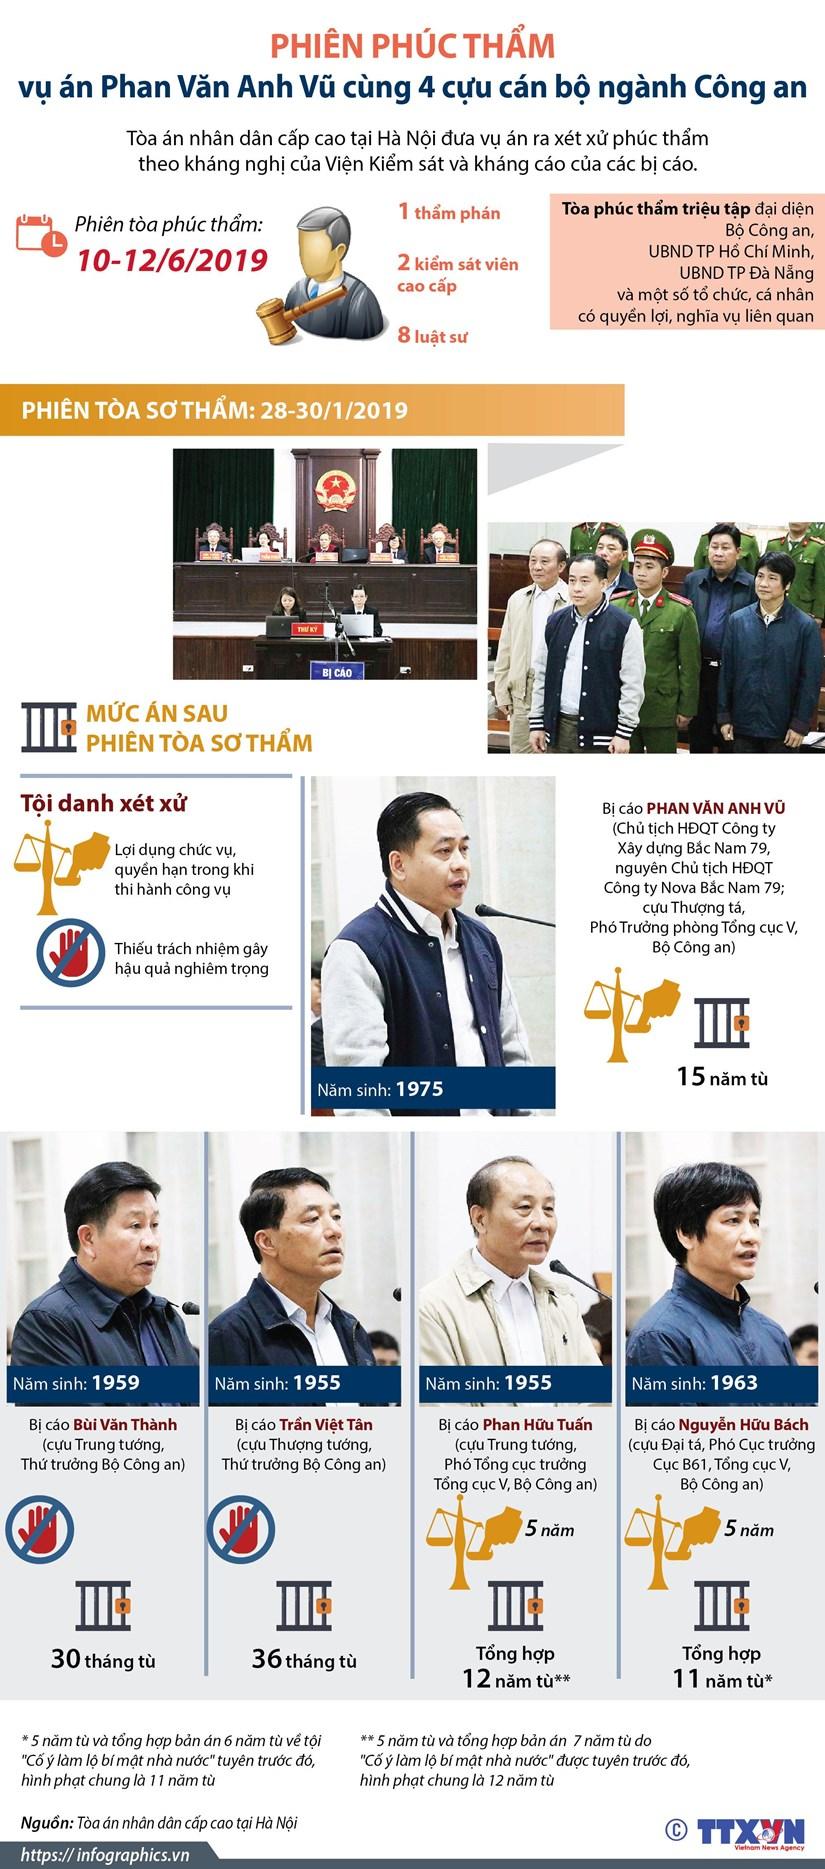 [Infographics] Mo phien phuc tham xet xu vu an Phan Van Anh Vu hinh anh 1